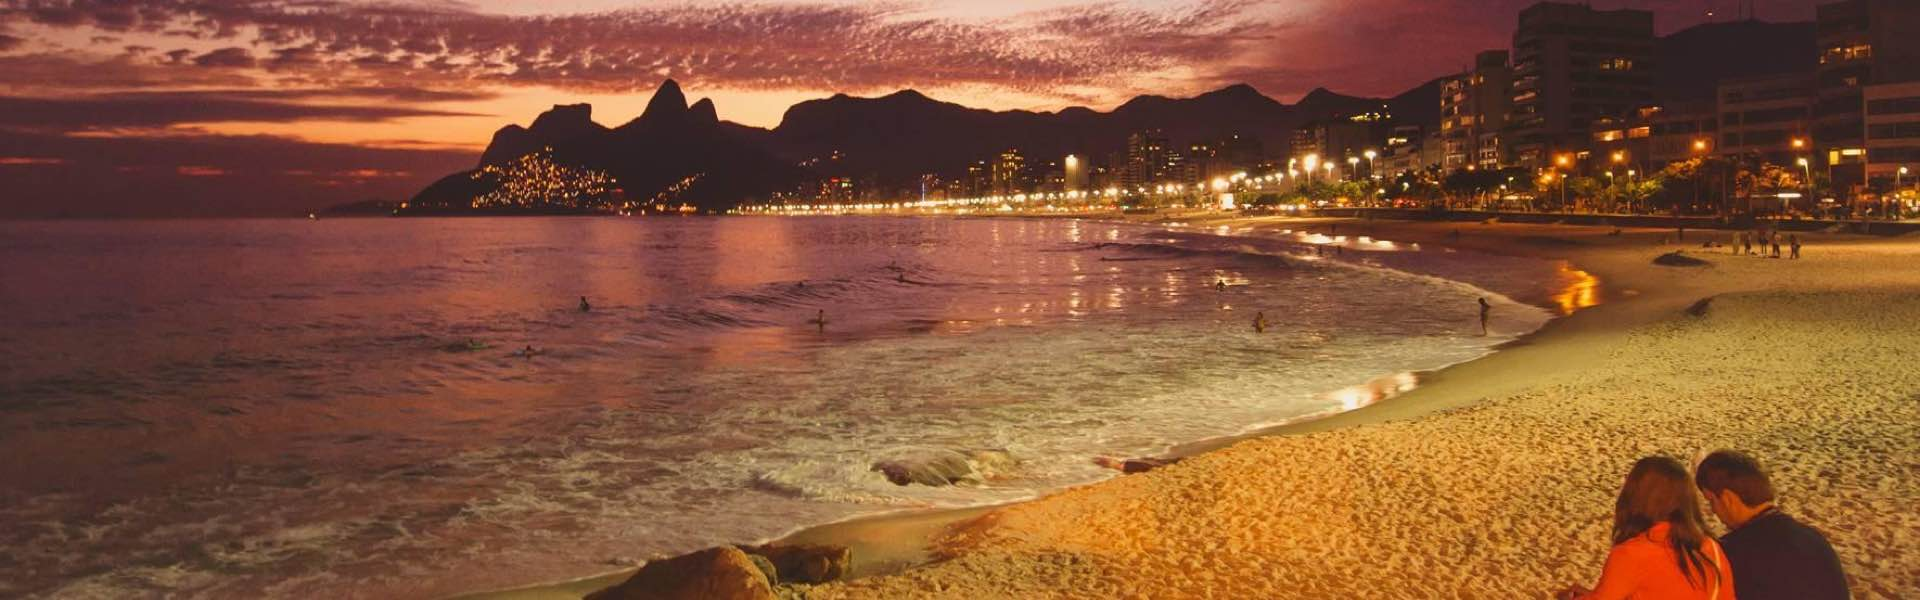 Praia-de-Ipanema